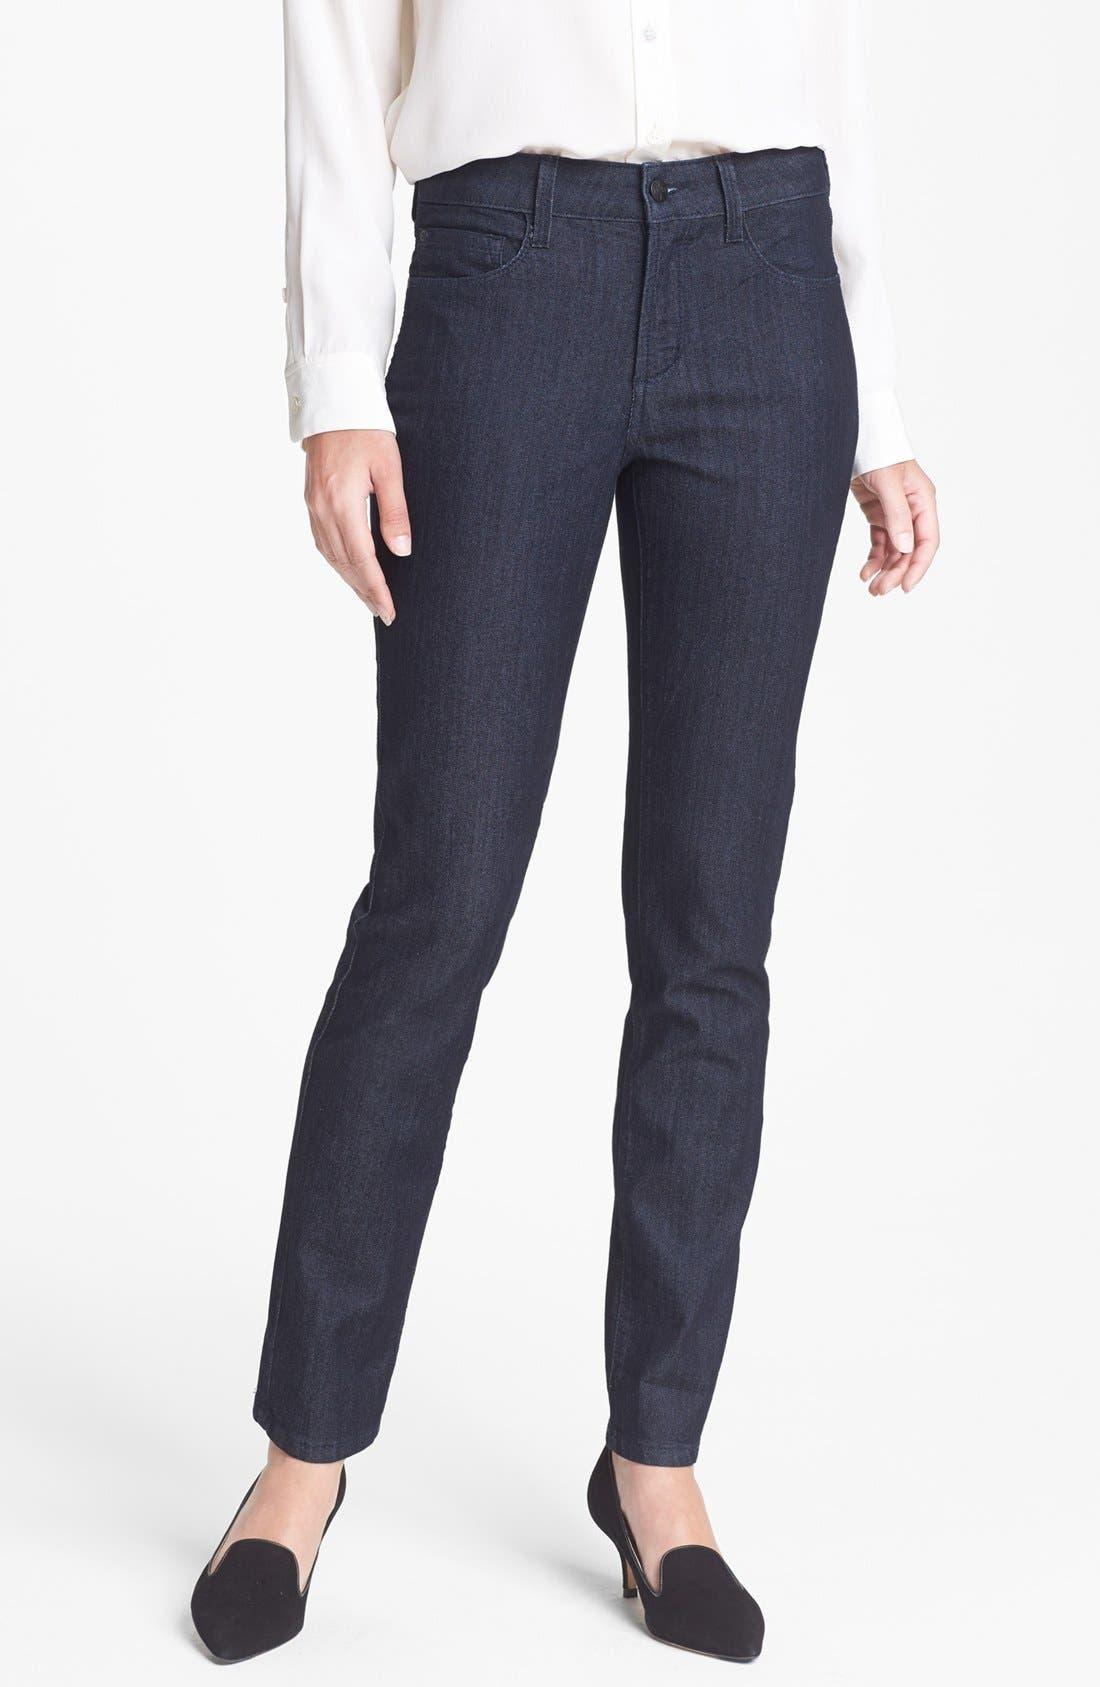 Main Image - NYDJ 'Alina' Stretch Skinny Jeans (Dark Enzyme) (Petite)